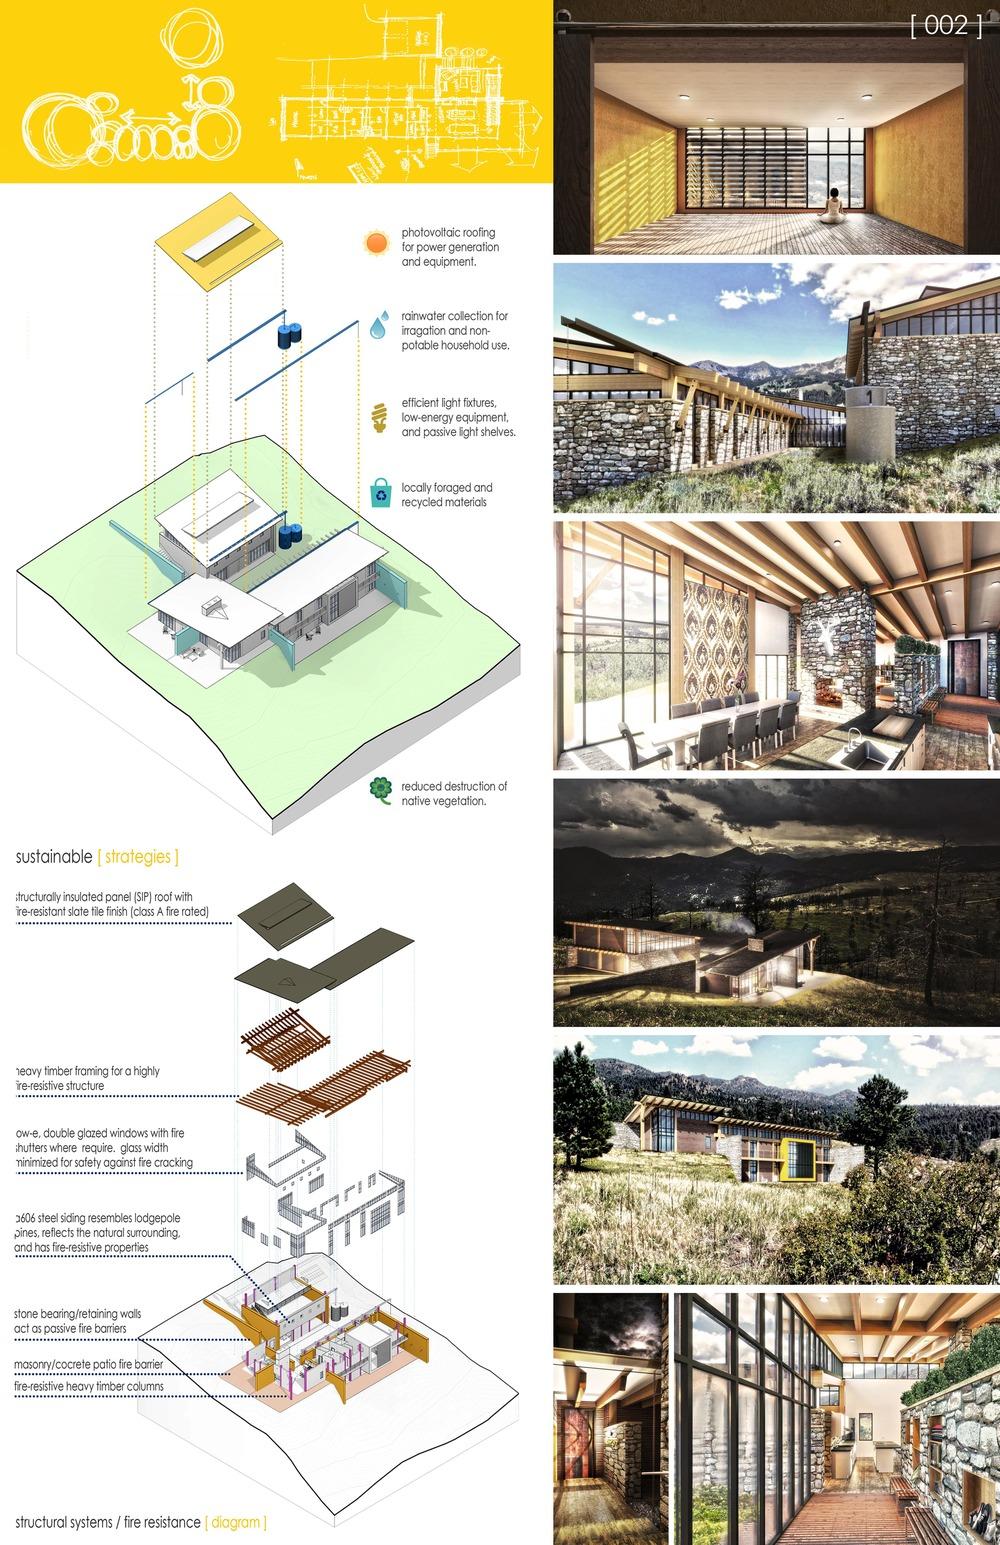 studiobad architects_jeffrey pinheiro_2of2.jpg